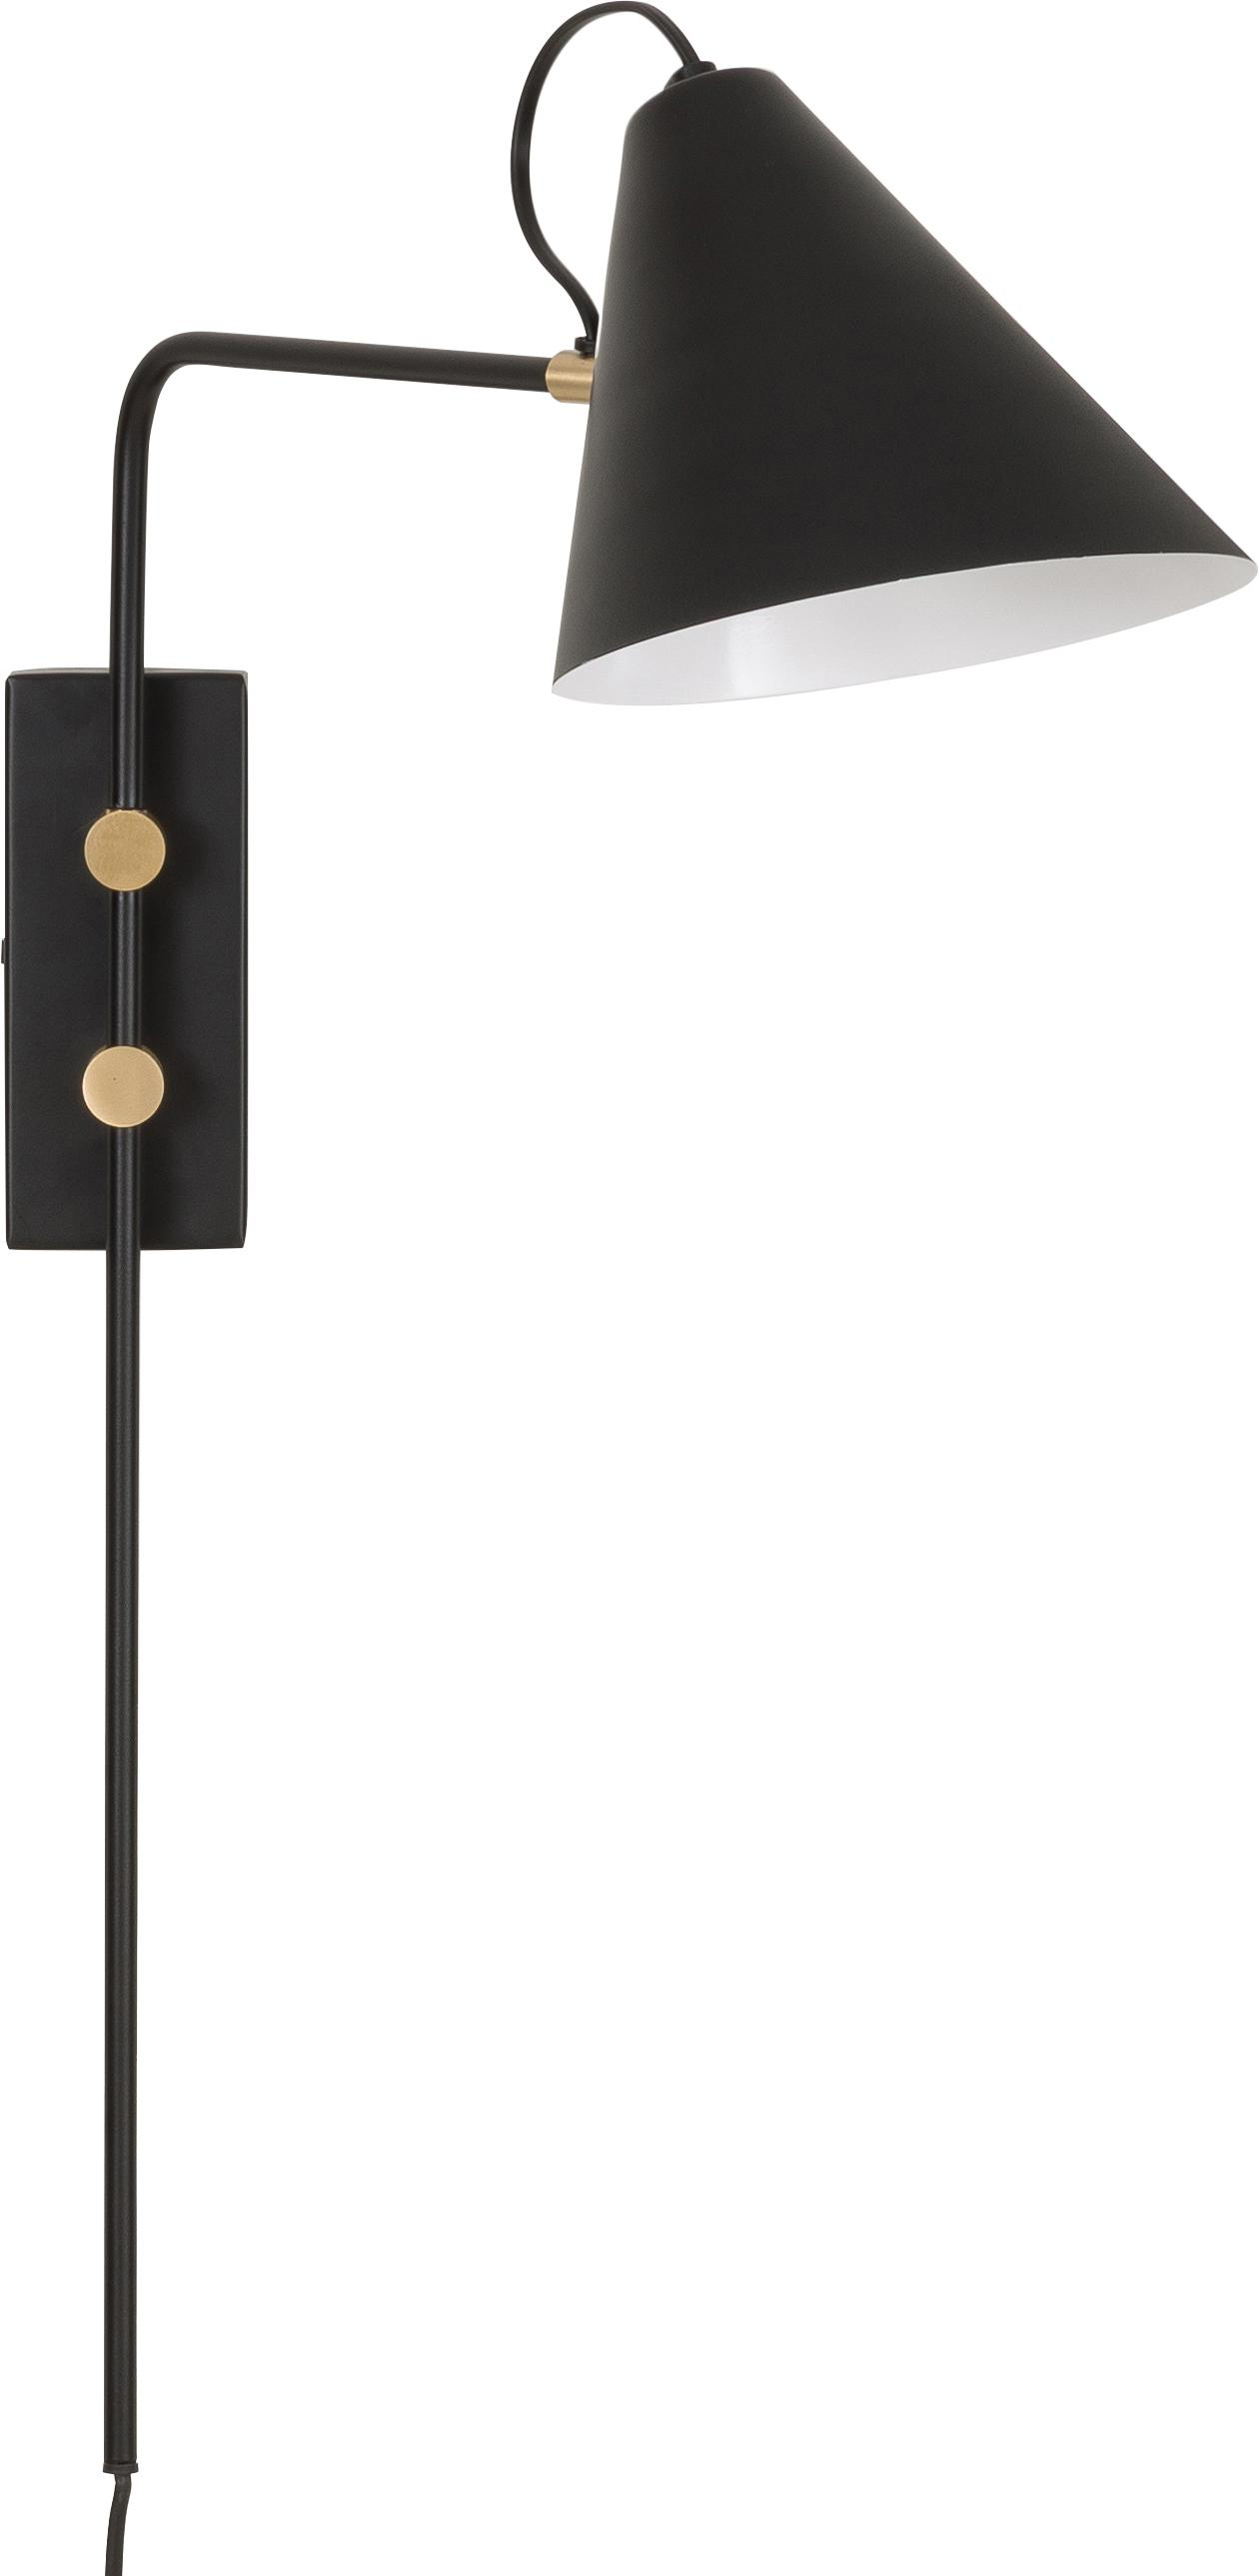 Wandlamp Club met stekker, Lamp: gepoedercoat ijzer, Lamp: zwart. Details: messingkleurig, B 20 cm